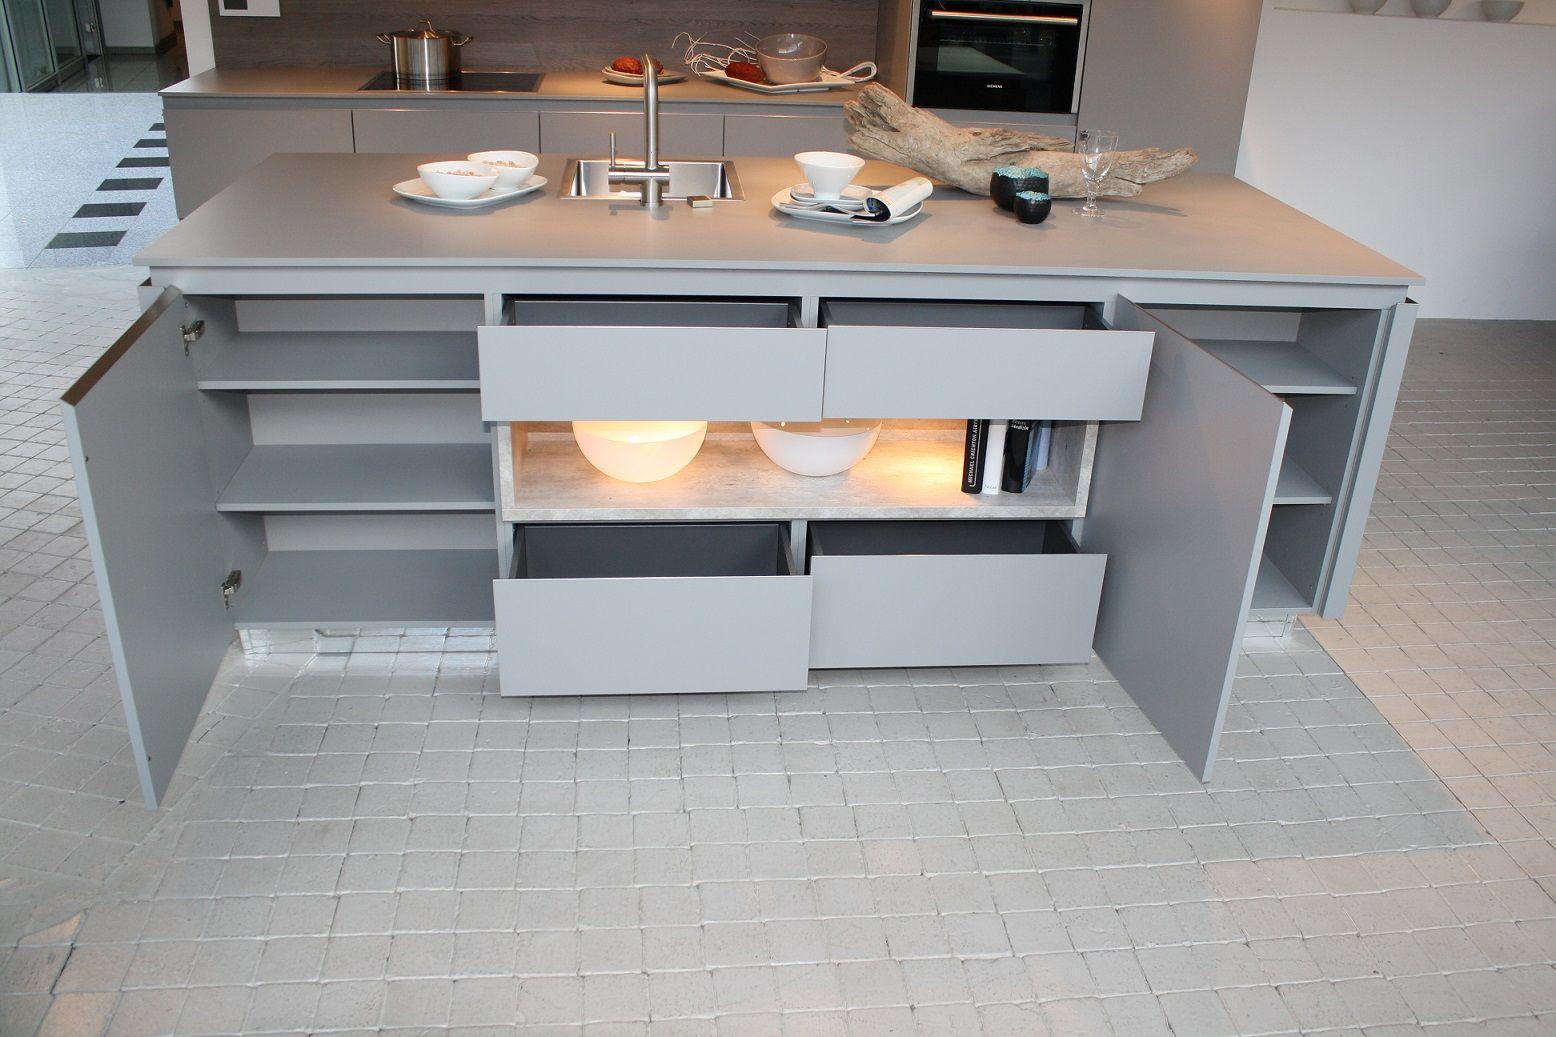 Moderne eiland keuken 1 5 51019 - Tafel centraal eiland ...